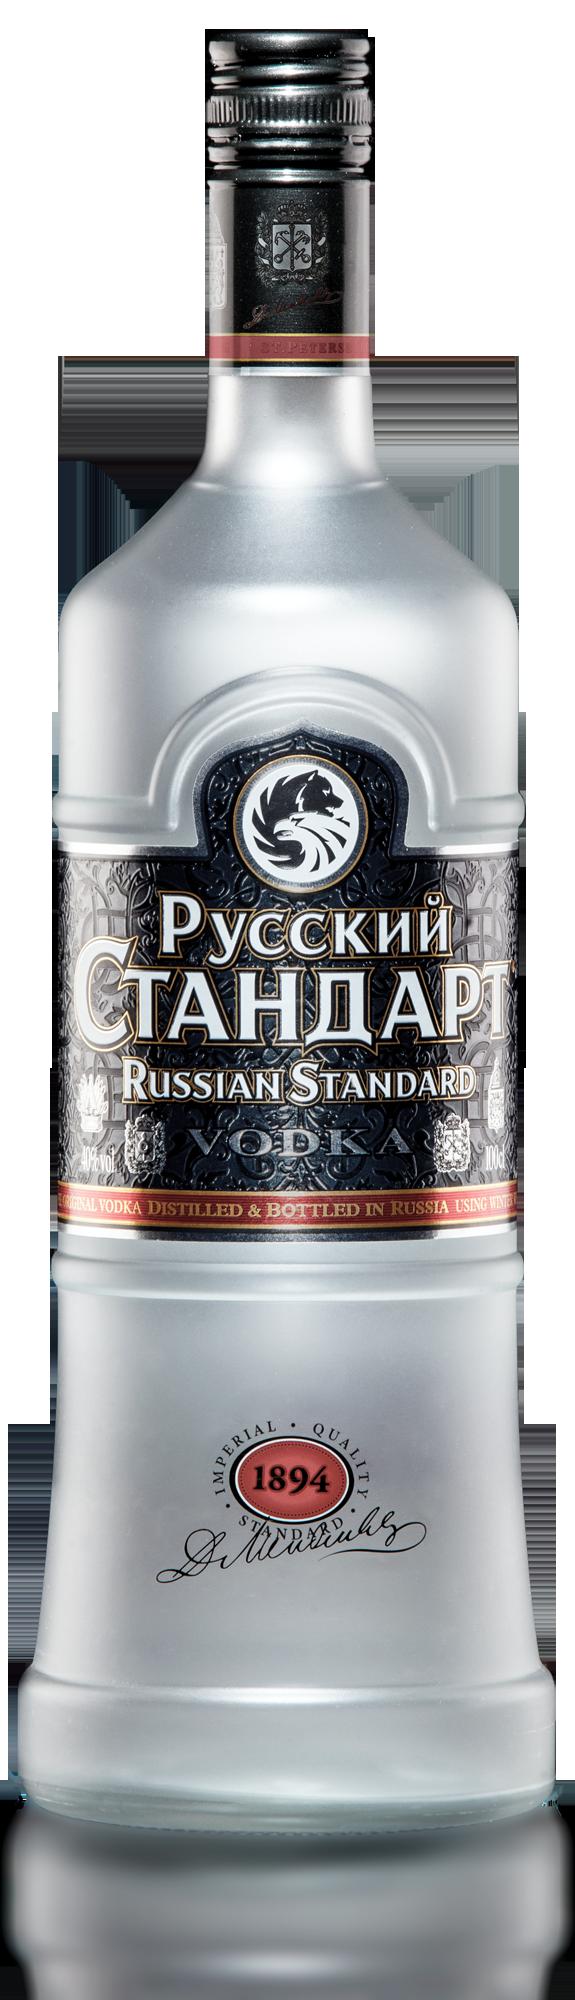 Vodka PNG - 10141